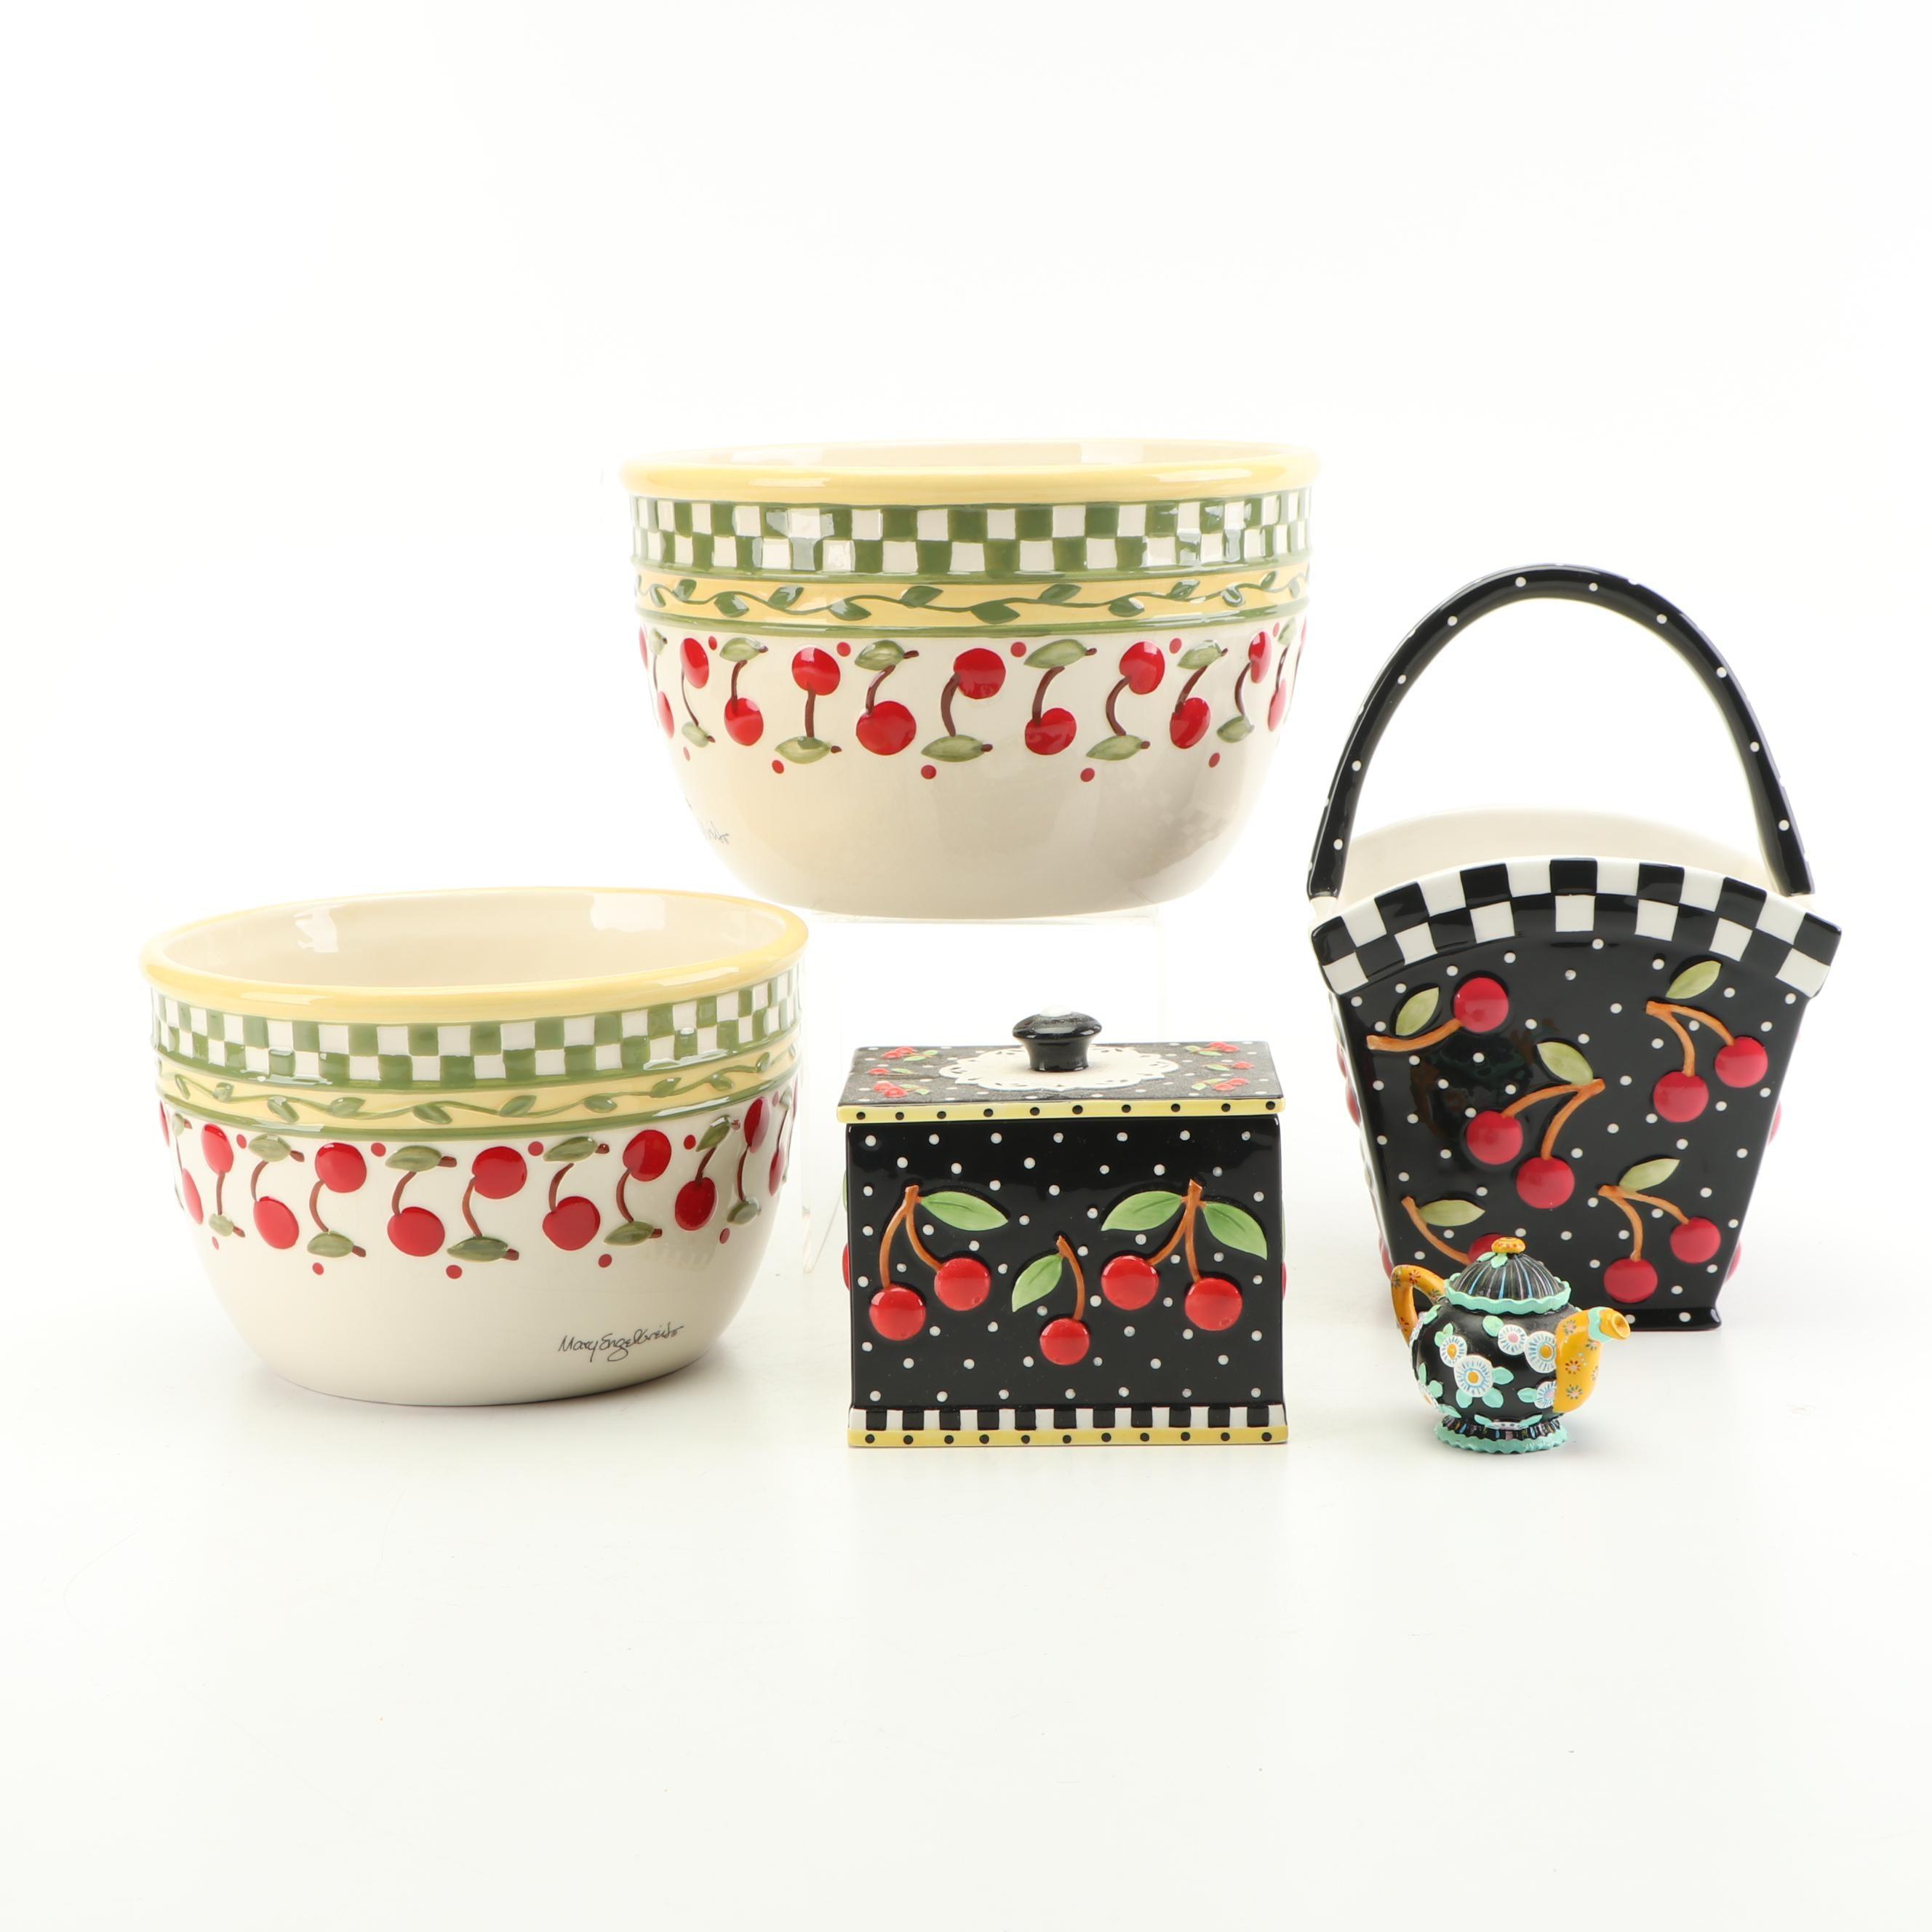 Mary Engelbreit Hand Painted Ceramic Serveware and Decor, 1998-2000